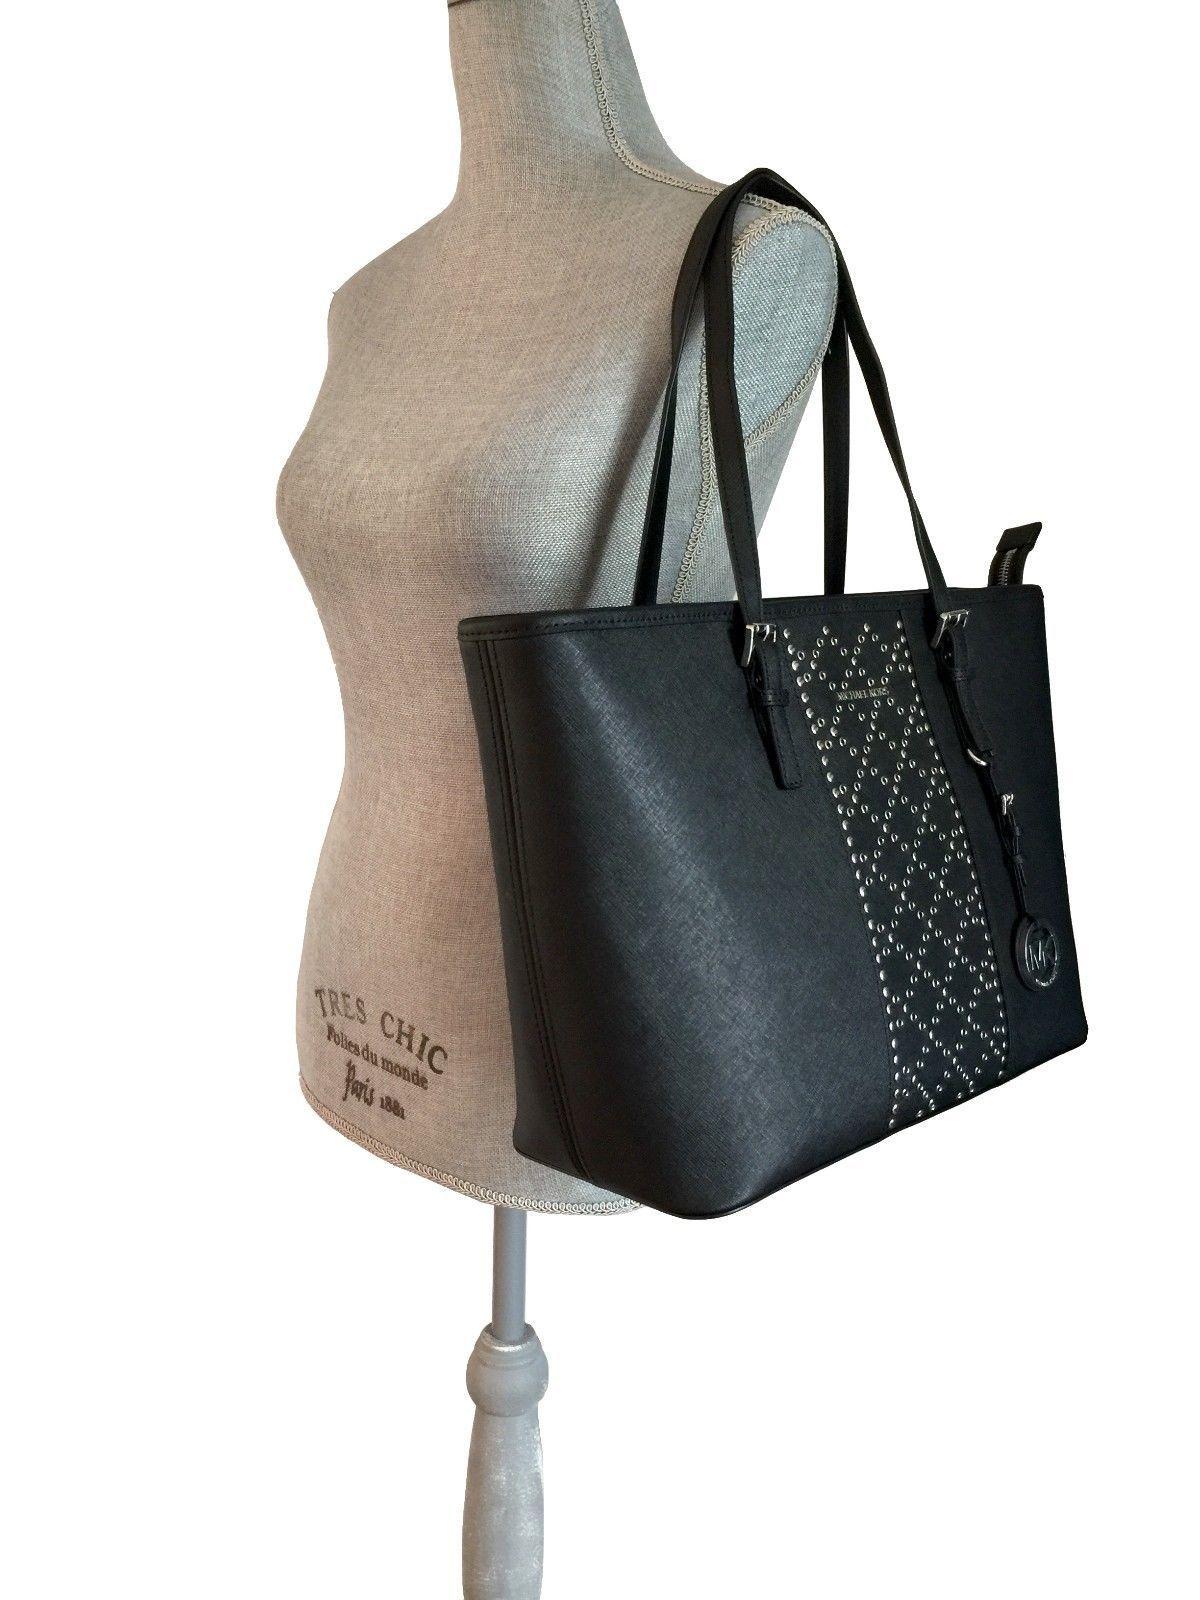 994ebba7d934 NWT MICHAEL KORS Jet Set Travel Top Zip Tote Black Grommet Leather Bag Purse